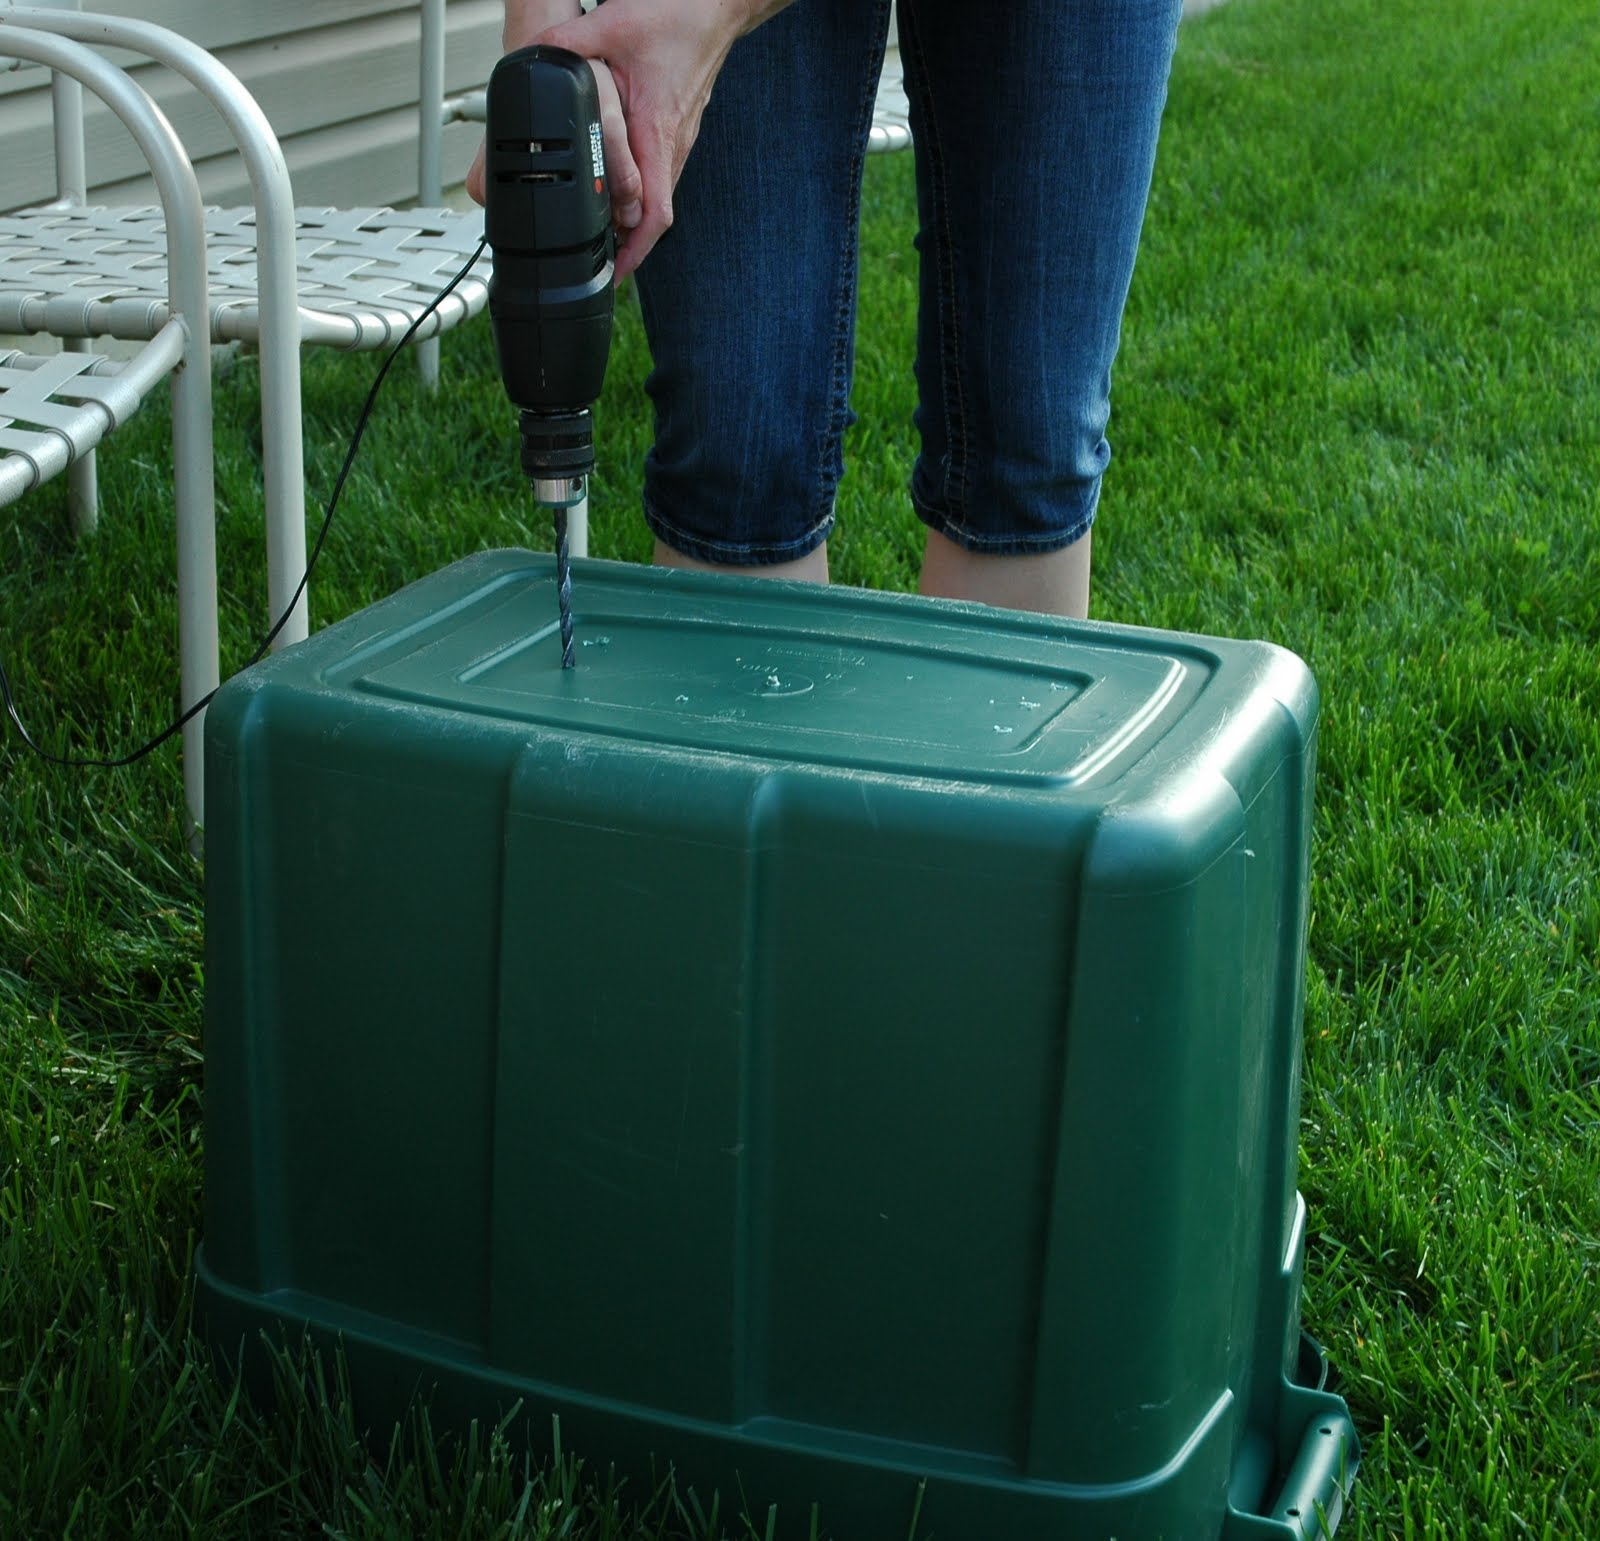 My Life And Good Times: DIY Compost Bin